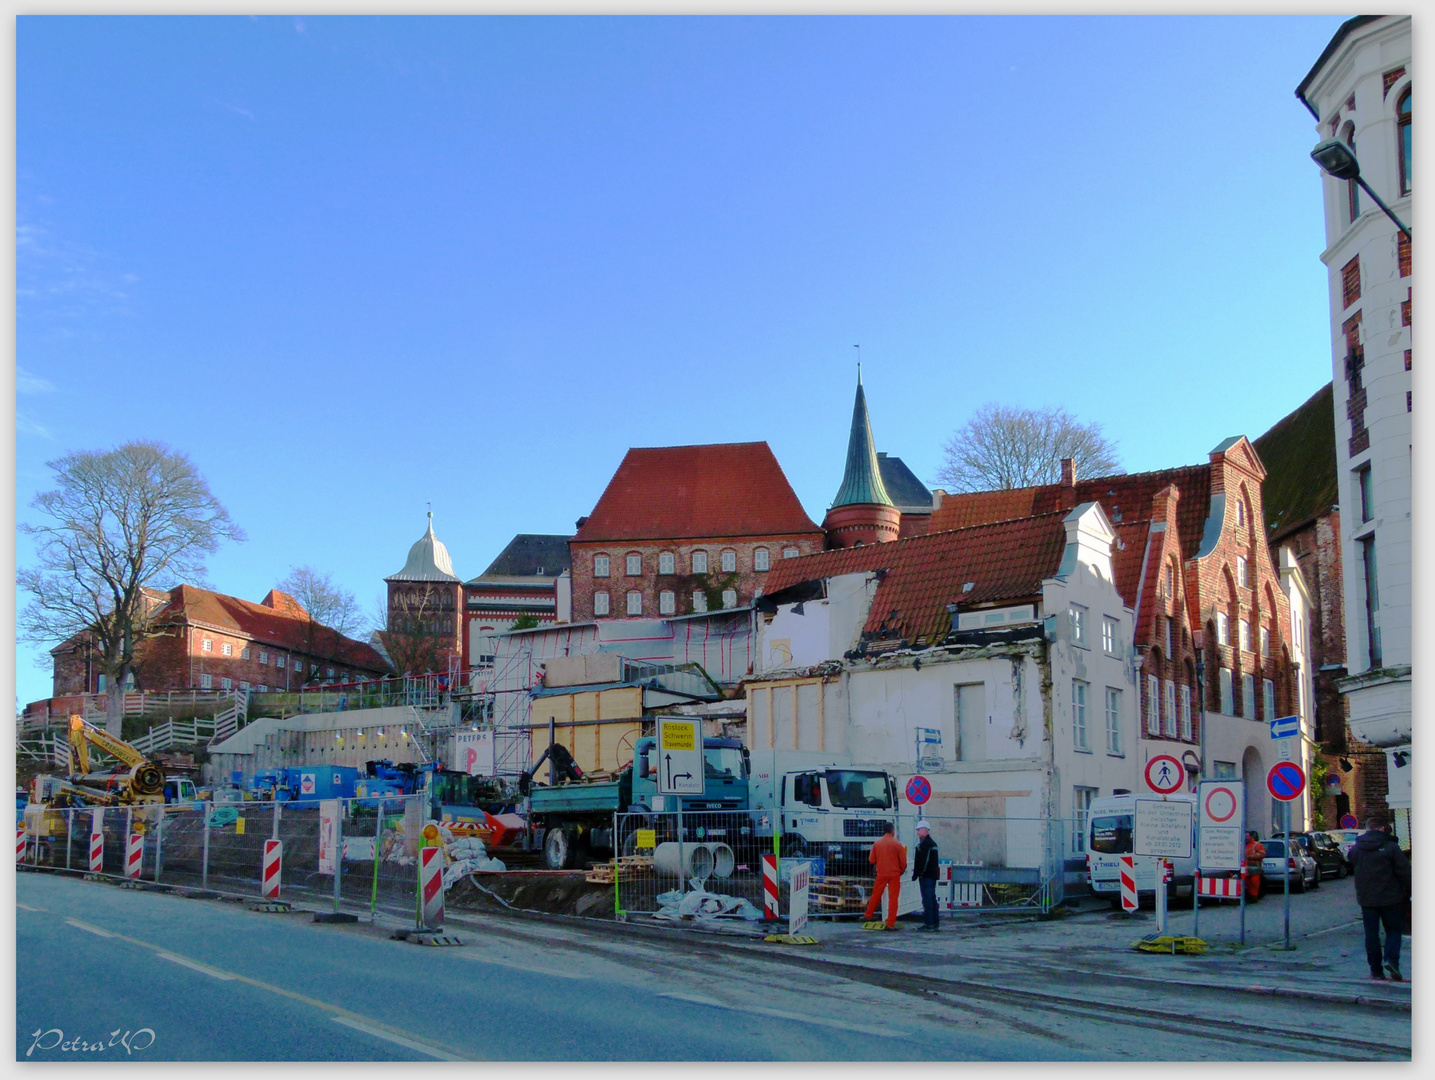 Baustelle Hansemuseum